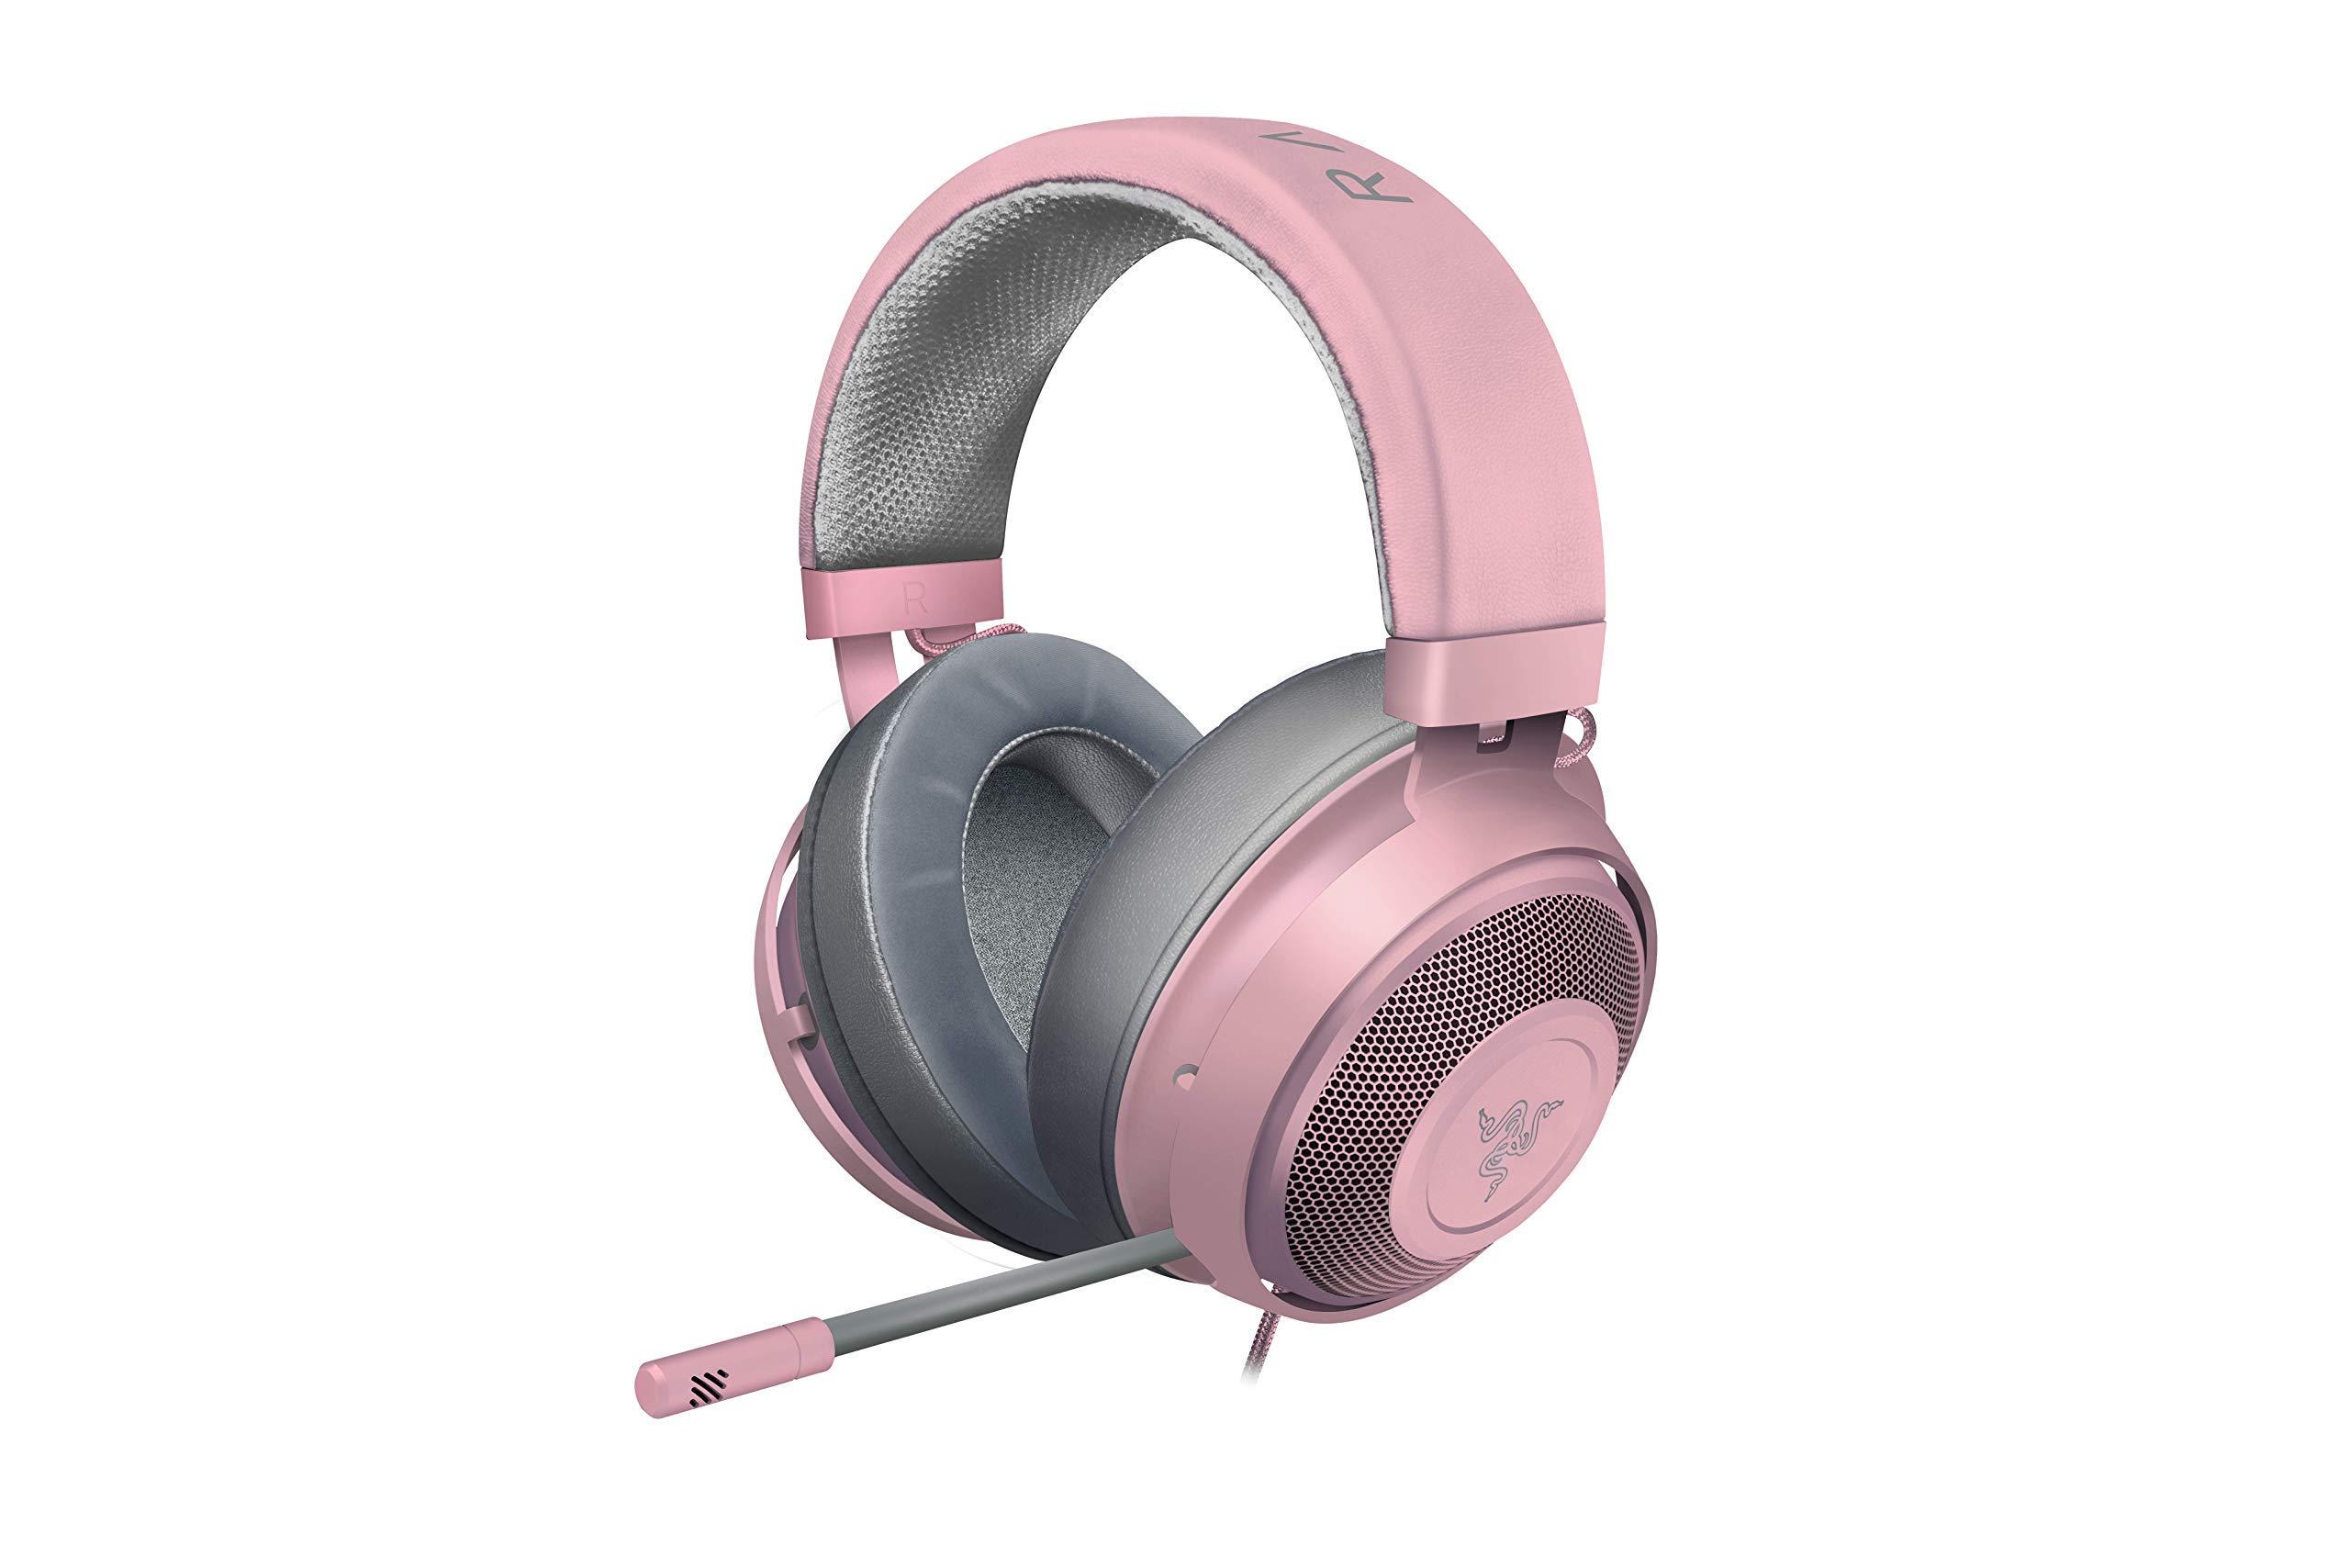 Razer Kraken Gaming Headset 2019: Lightweight Aluminum Frame - Retractable Noise Cancelling Mic - for PC, Xbox, PS4, Nintendo Switch - Quartz Pink (Renewed) by Razer